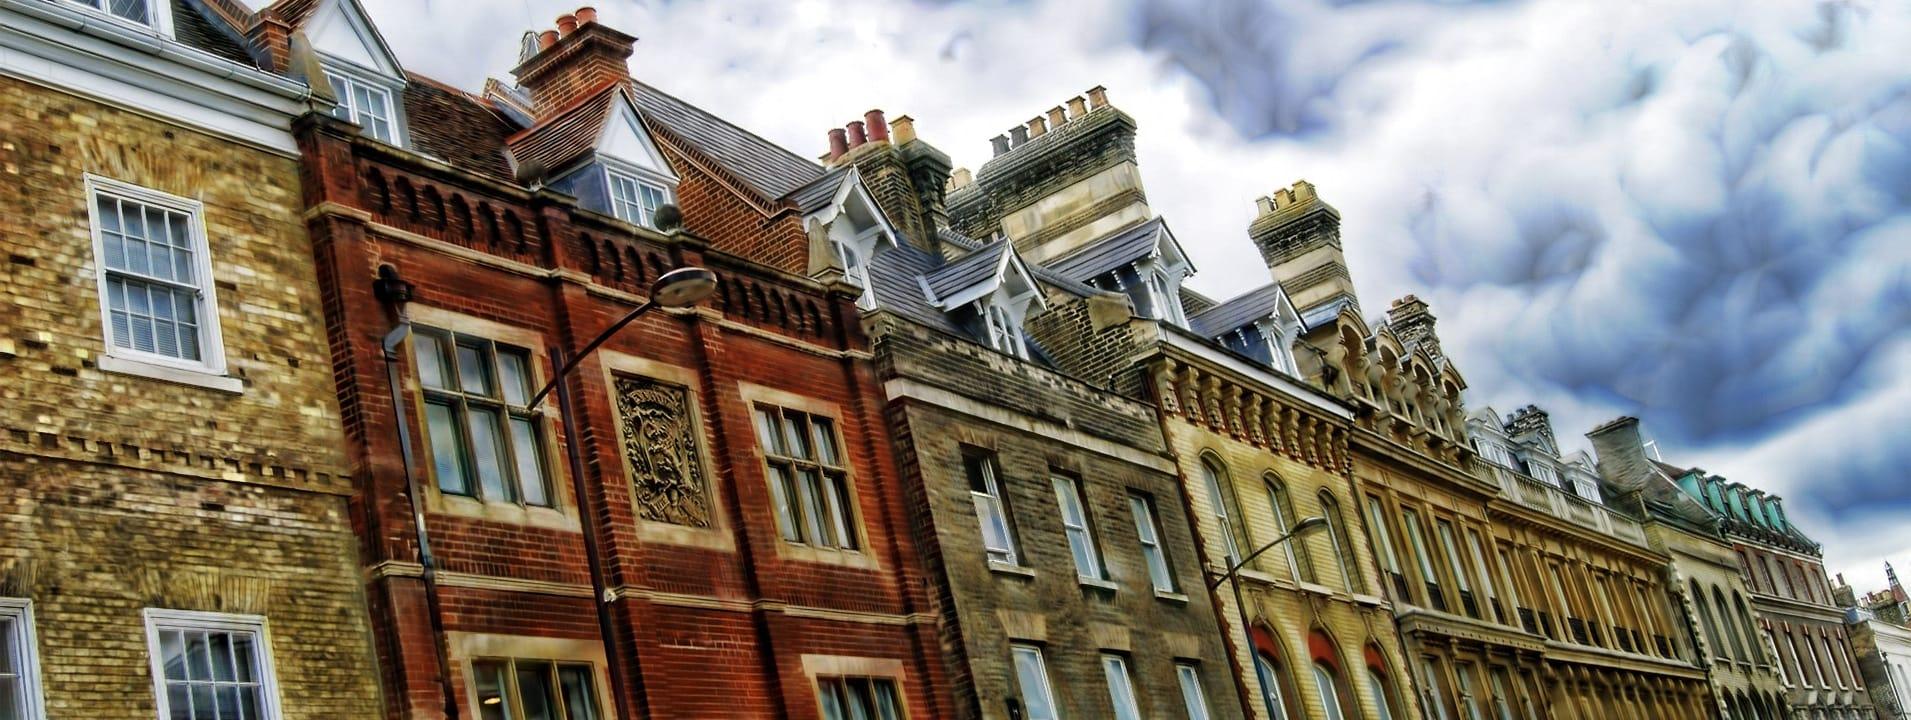 Row of houses - UK Housing Market